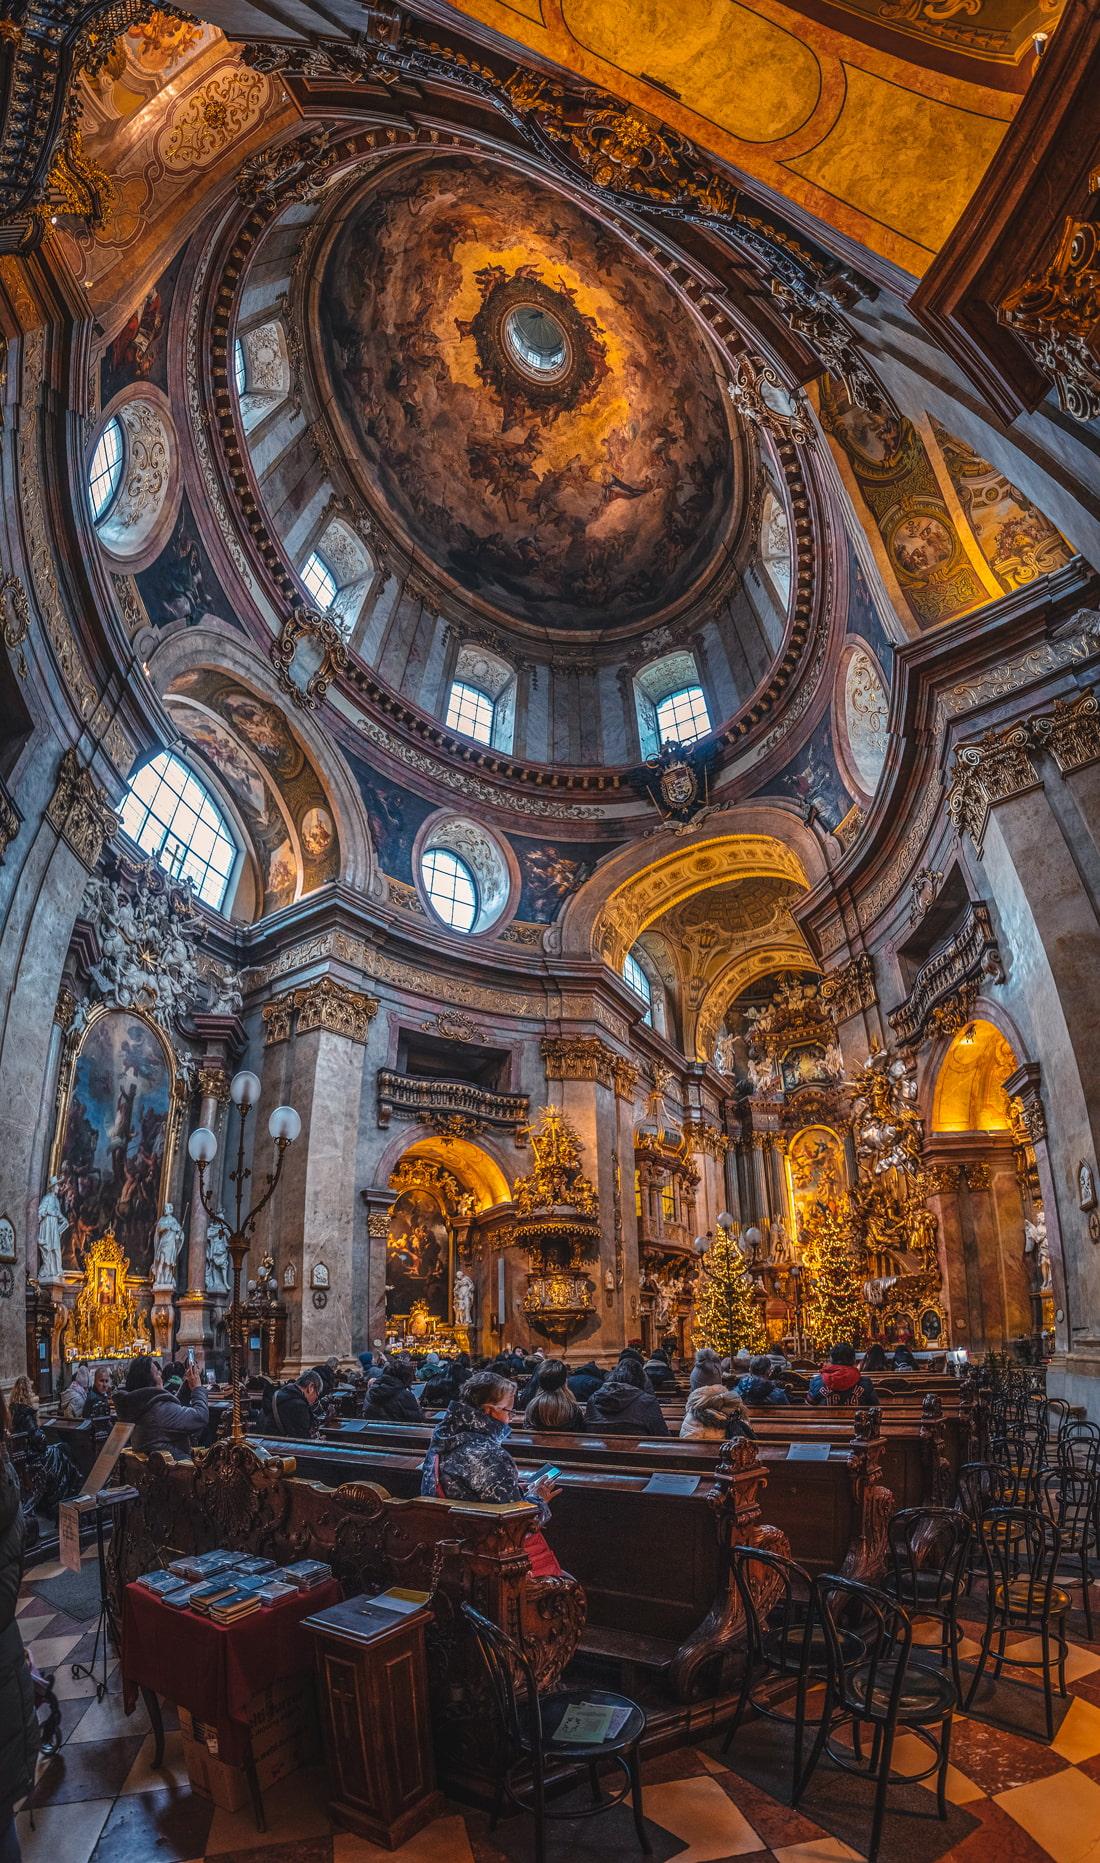 Baroque art inside this church in Vienna